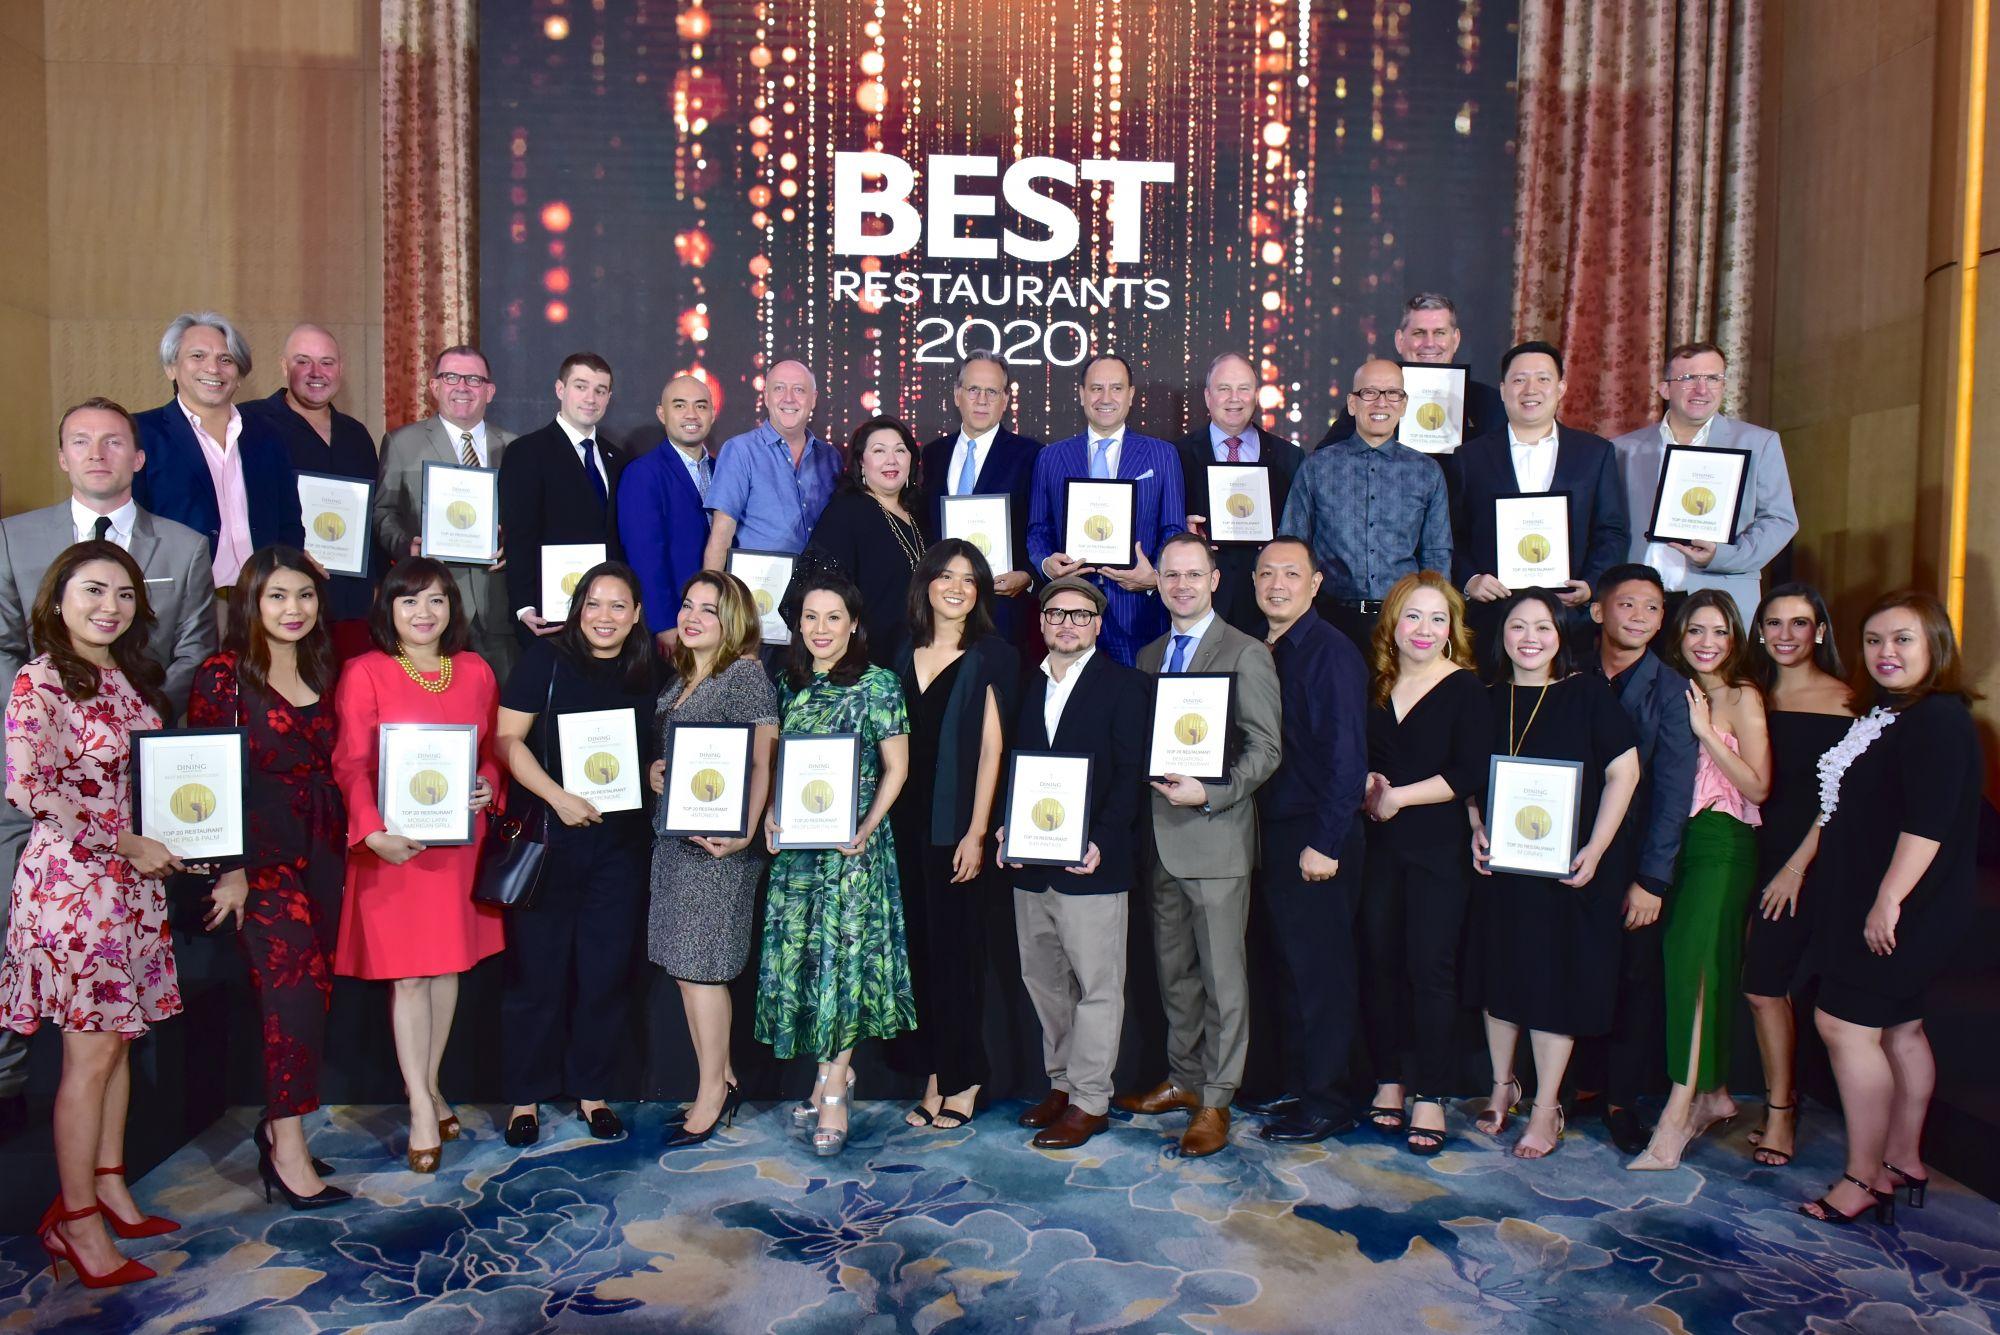 T.Dining's Best Restaurants Guide (BRG) 2020 Awards Night